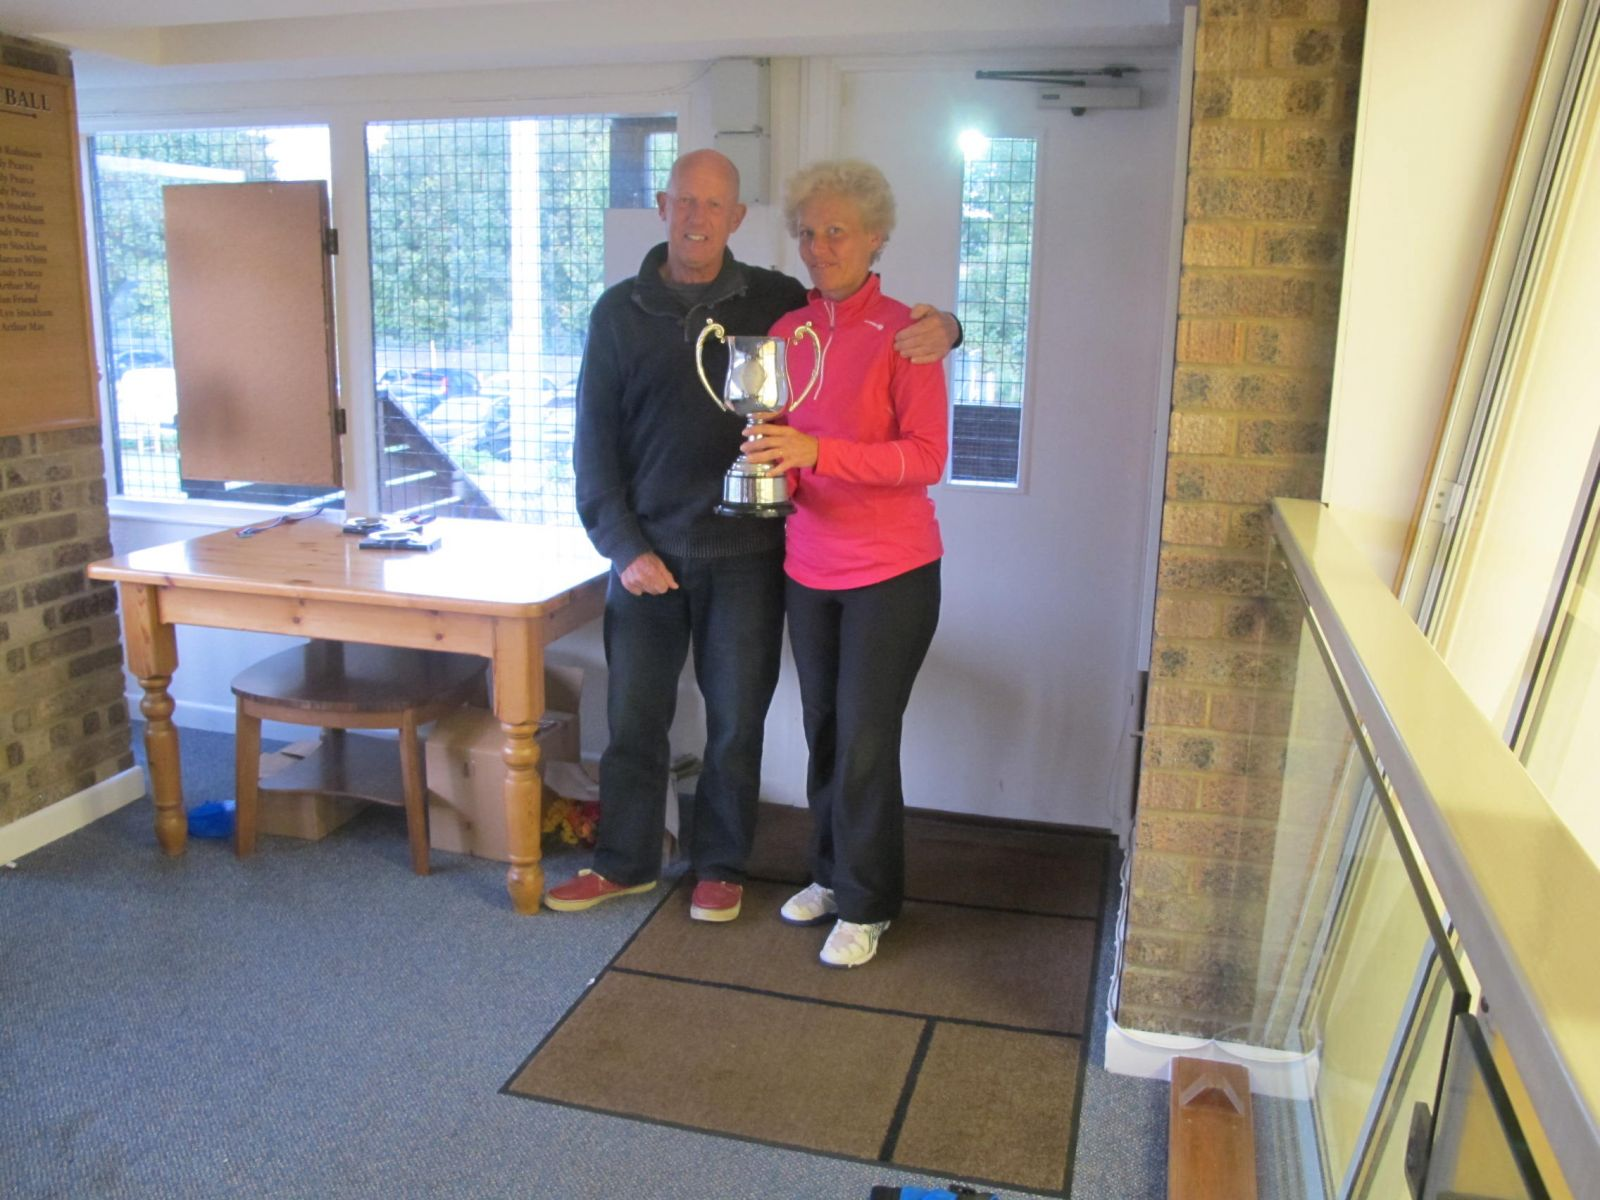 Yvonne Henderson, 2014 Rod Skidmore Memorial Trophy winner for winning the most main events